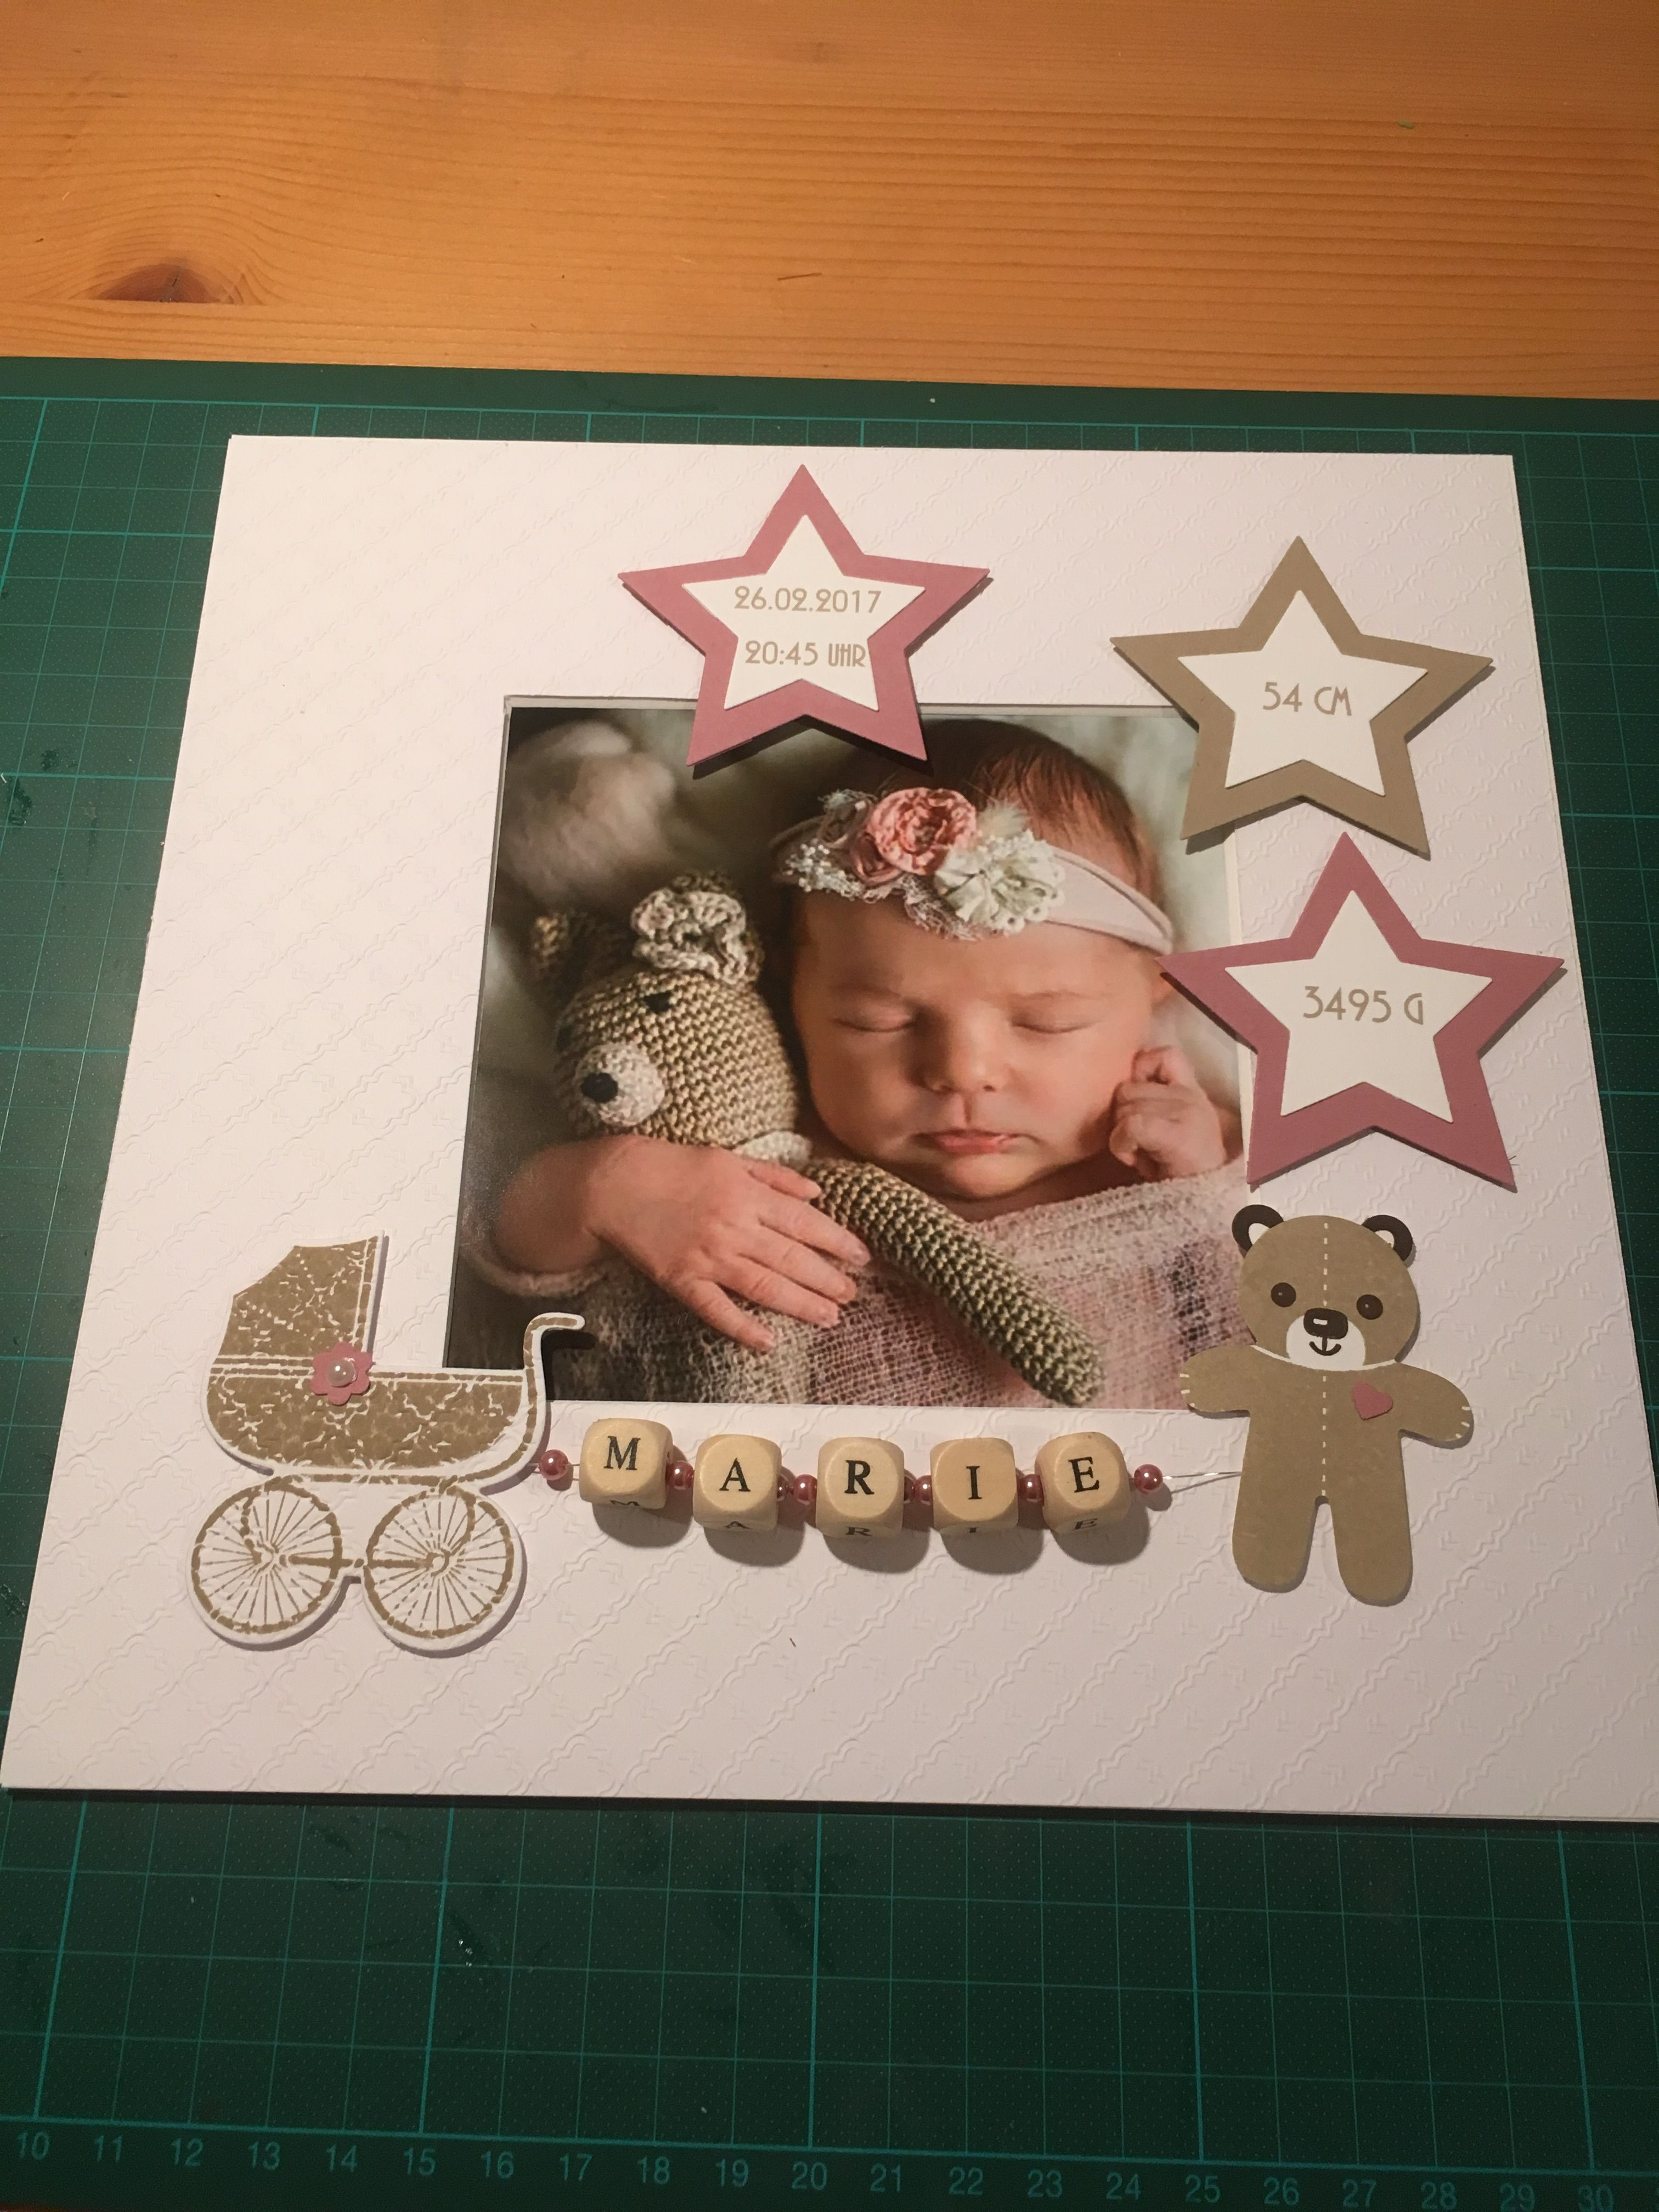 Pin de Me en baby/children\'s gifts   Pinterest   Cuadro, Coser y Cosas